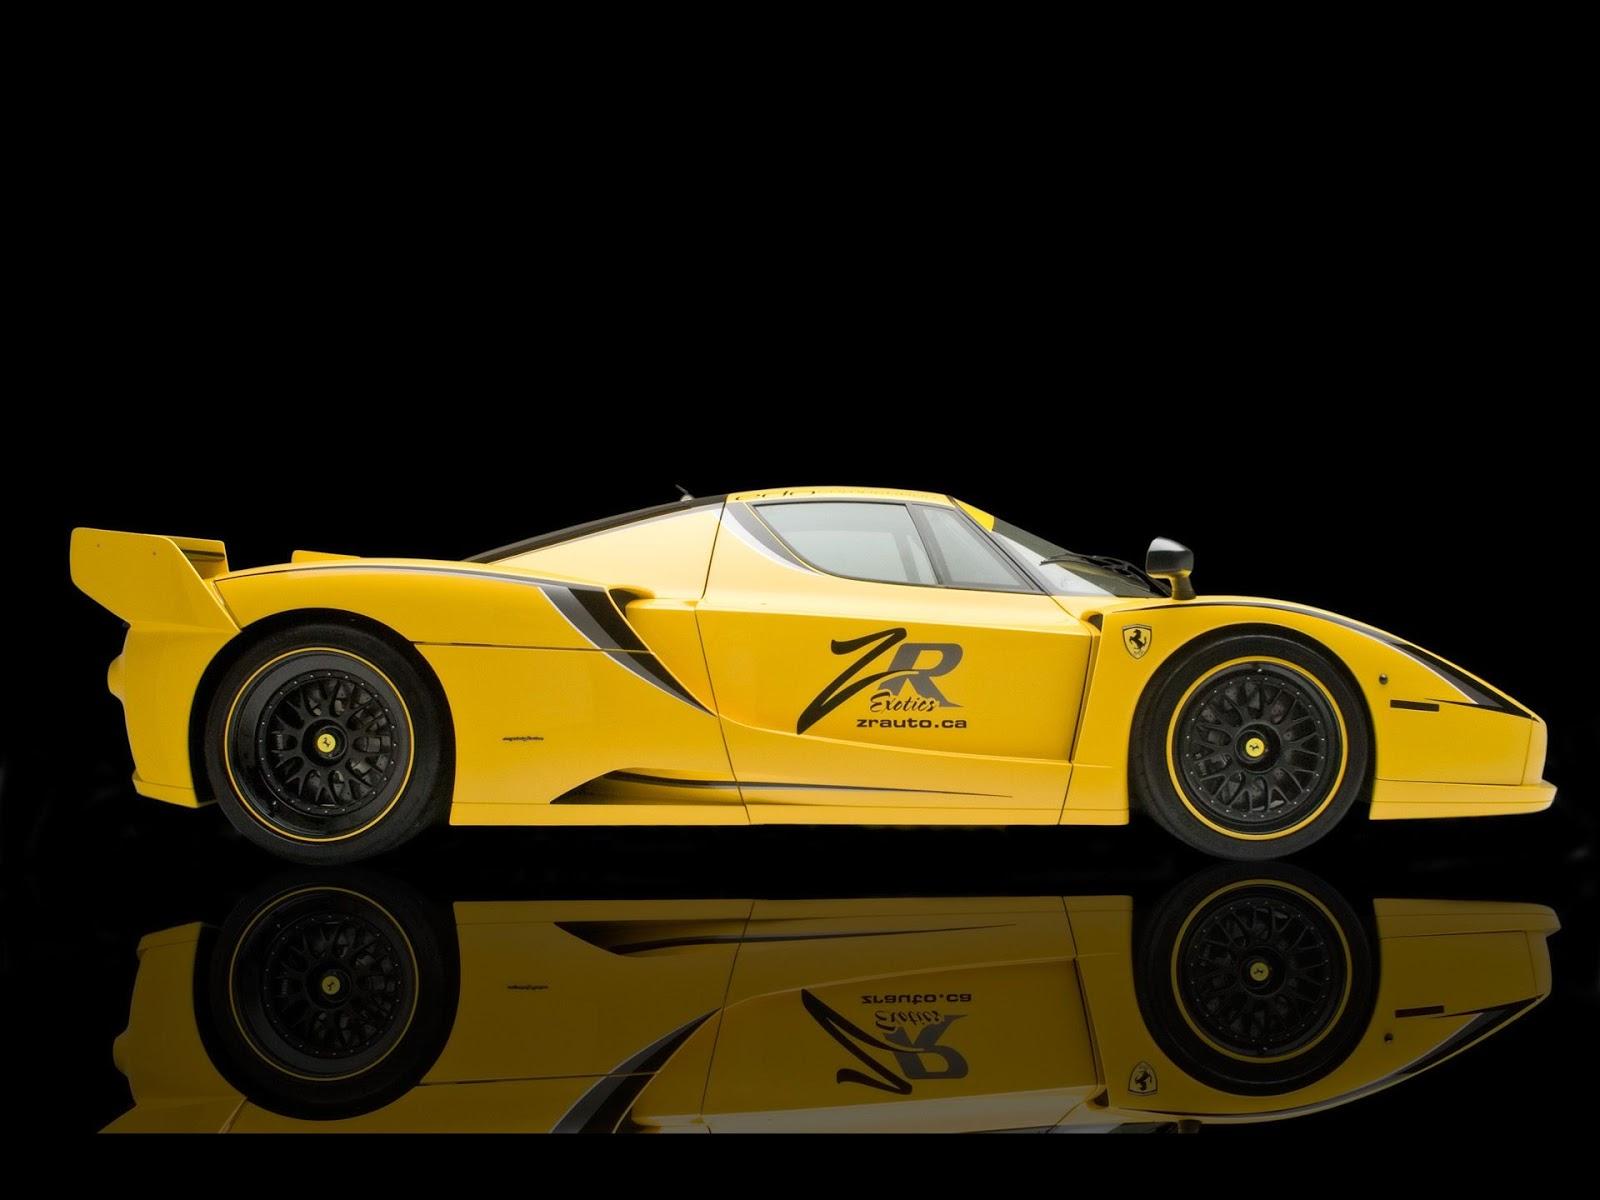 HD Wallpapers | Desktop Wallpapers 1080p: Ferrari Enzo EDO ...